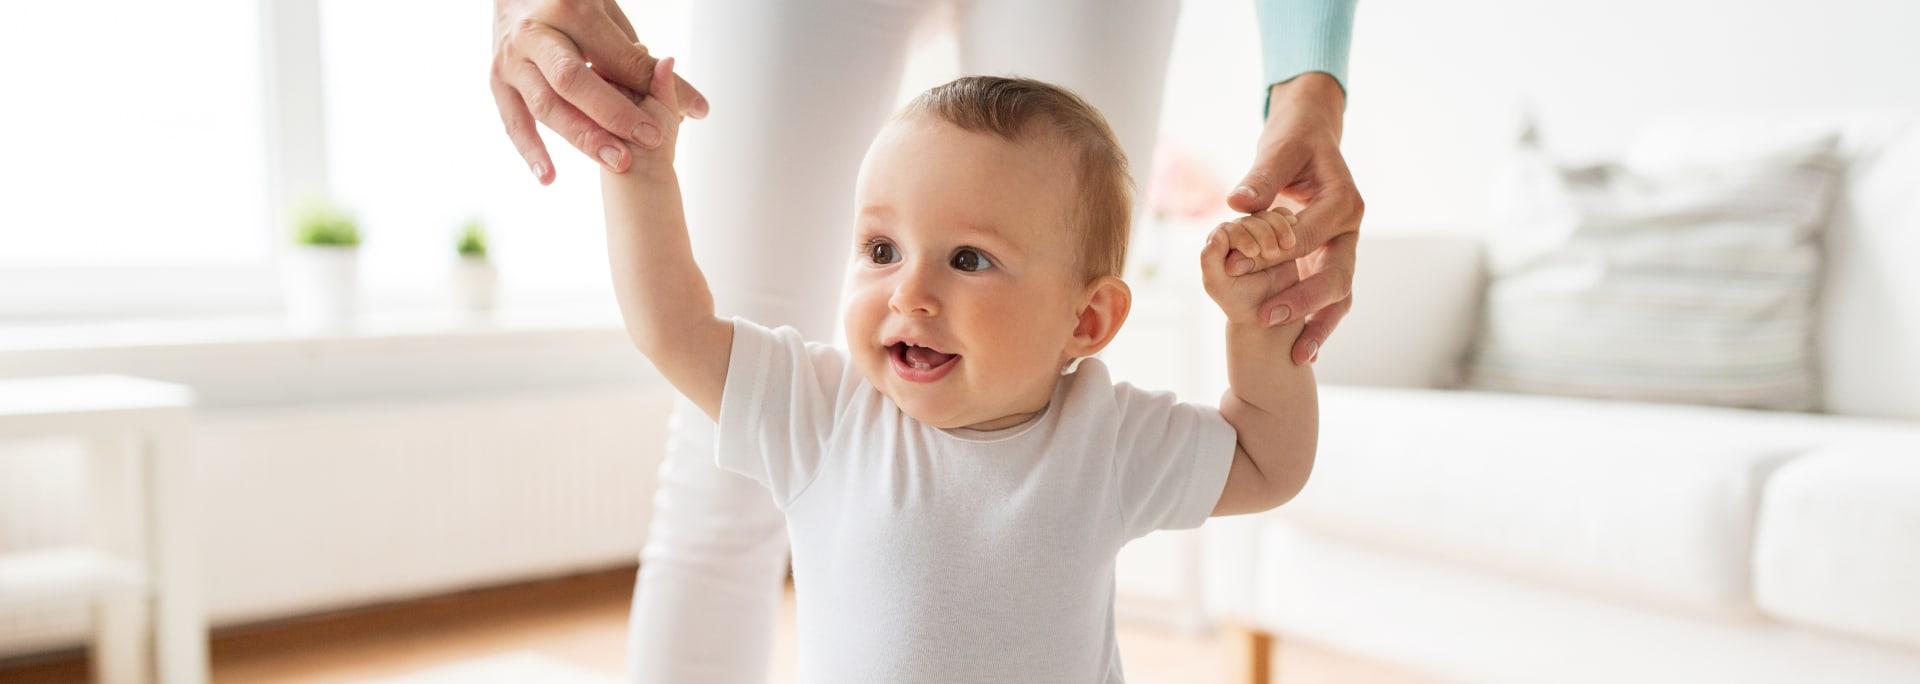 primeros pasos de tu bebé